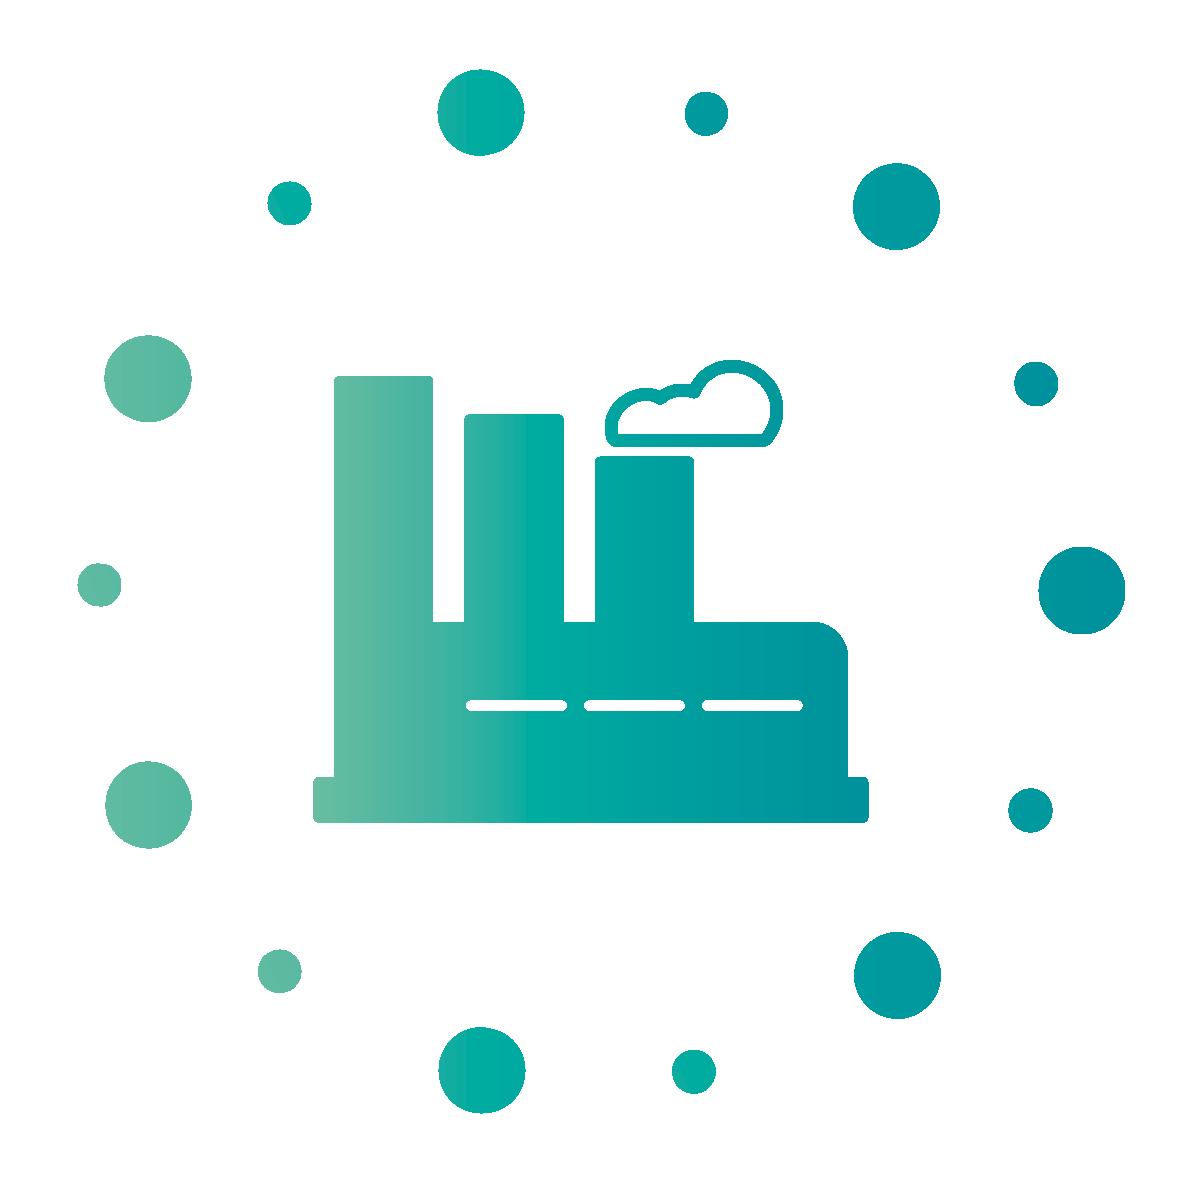 univ-icon-industry